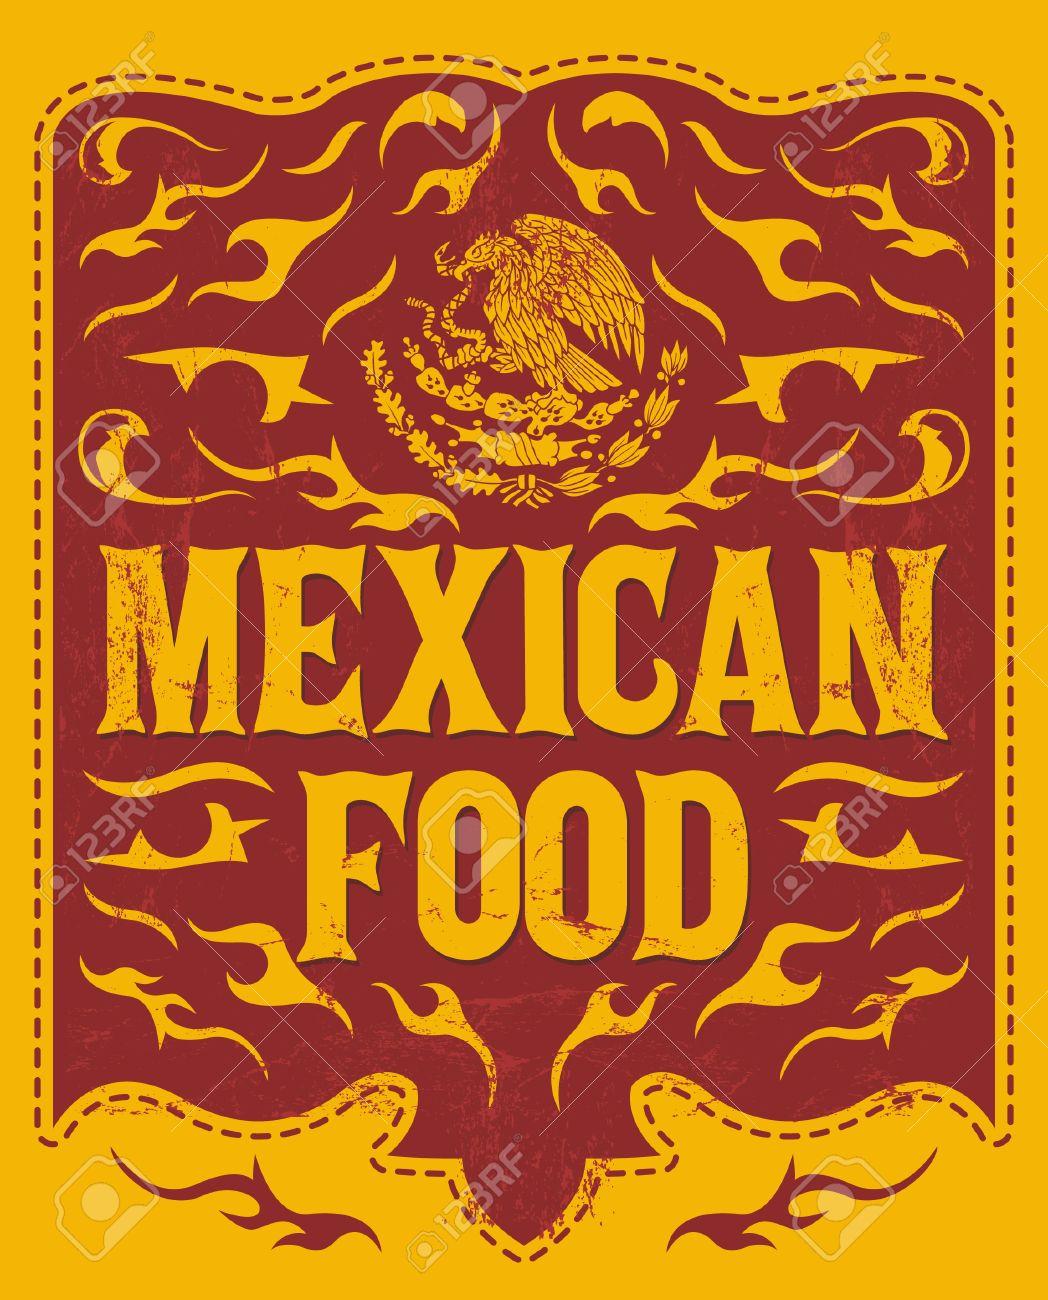 mexican food vintage restaurant menu design western style